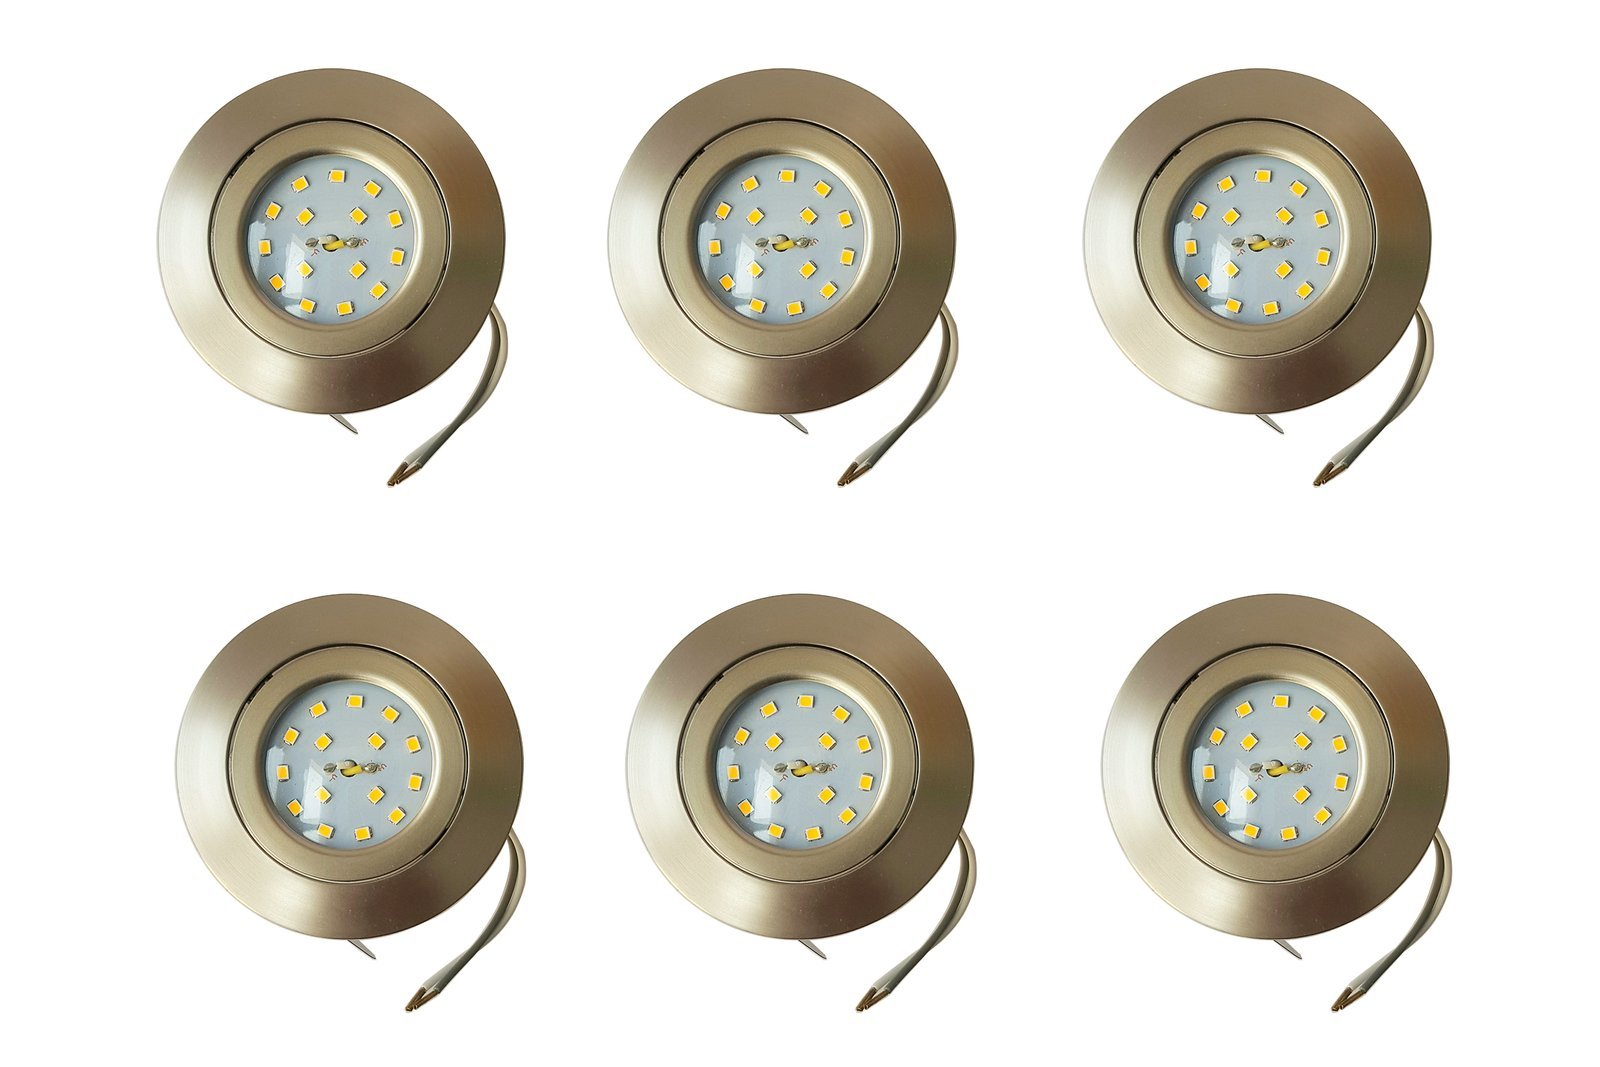 Wink grooving 5W LED B.K.Licht 10-03-06-S